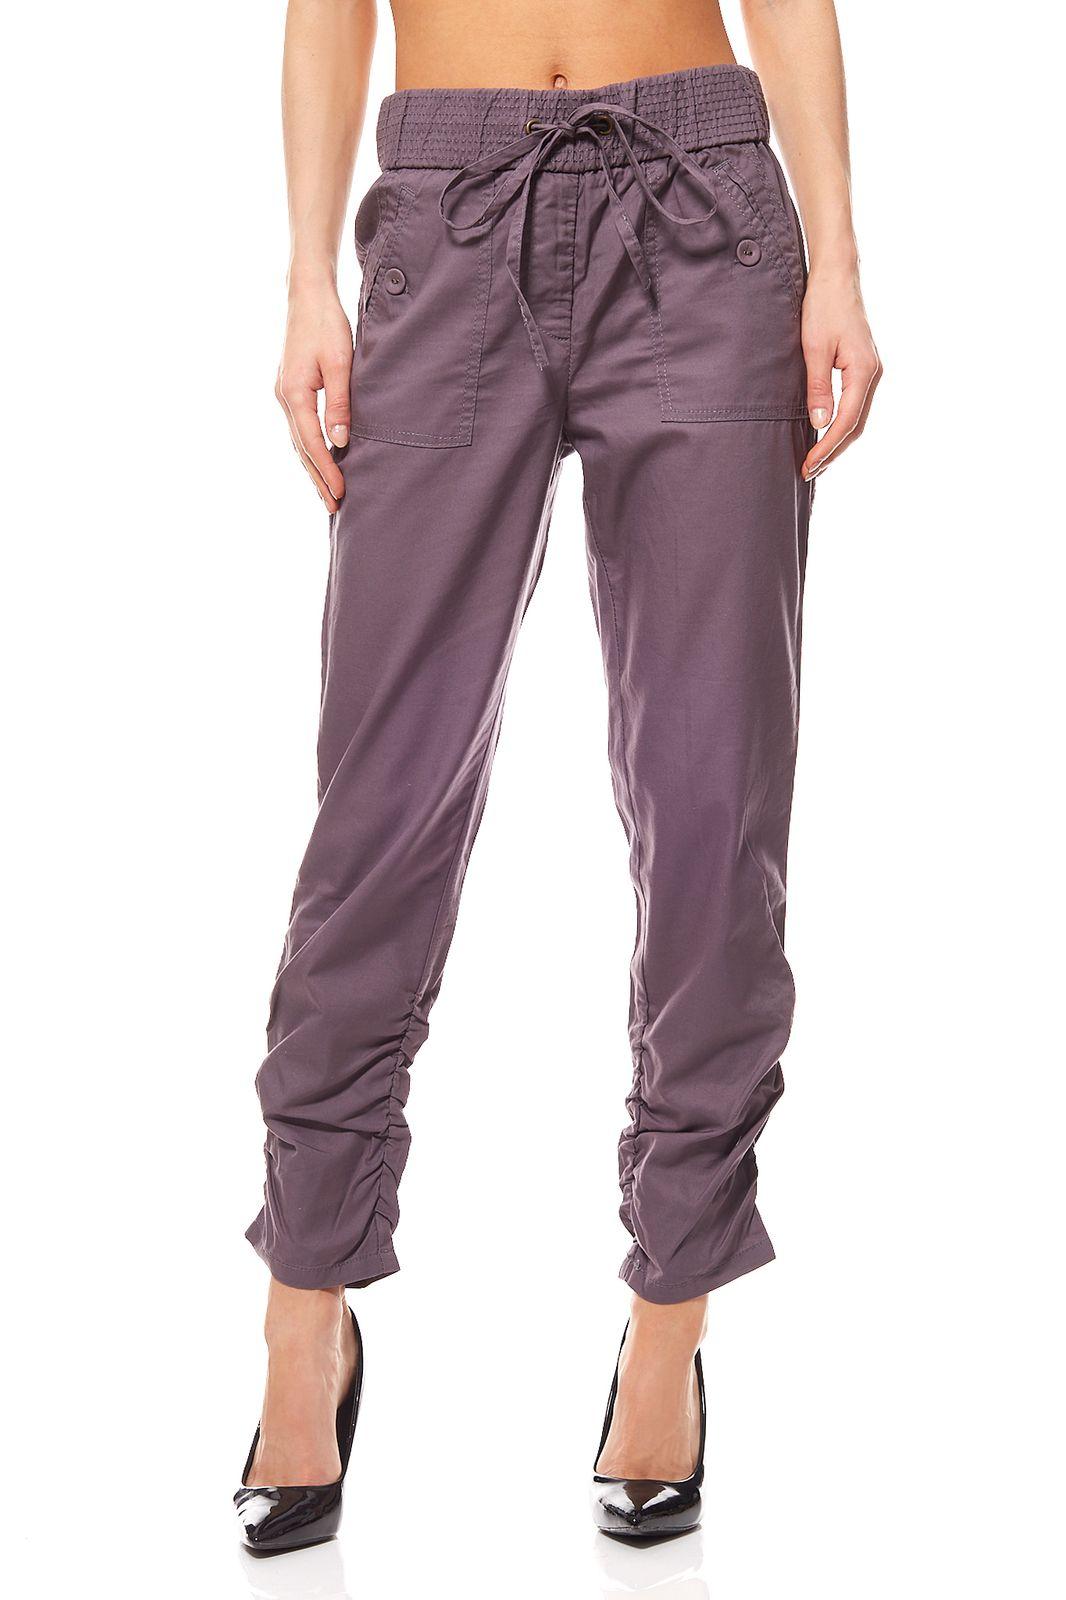 BuenaVista Malibu 7//8 Stretch Twill Damen Jeans Hose 7//8 Röhrenjeans Sommerhose